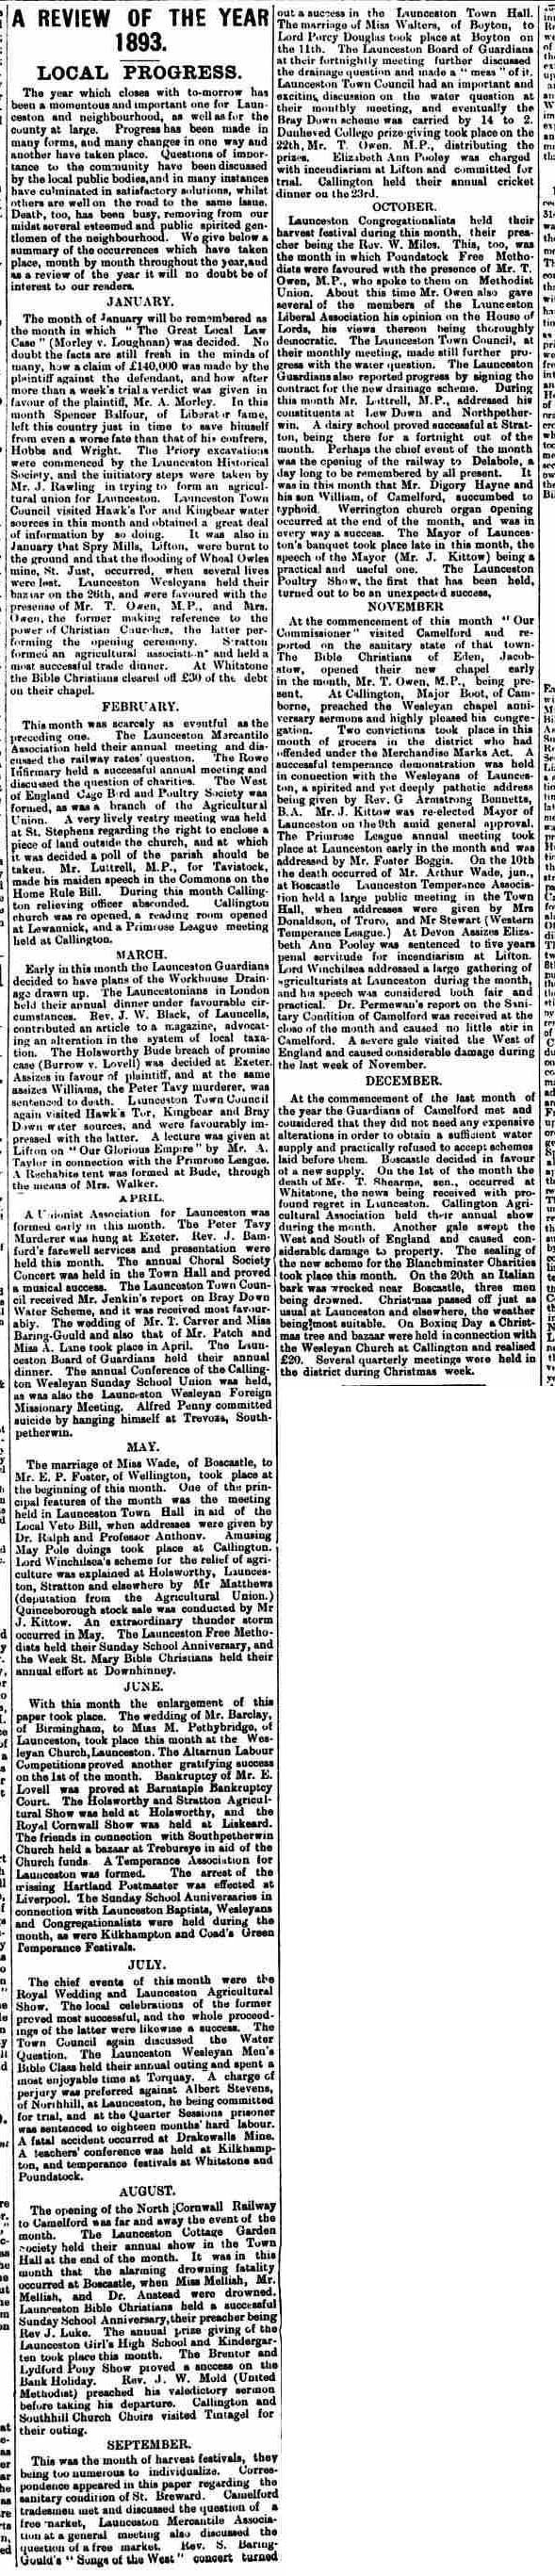 30 December 1893